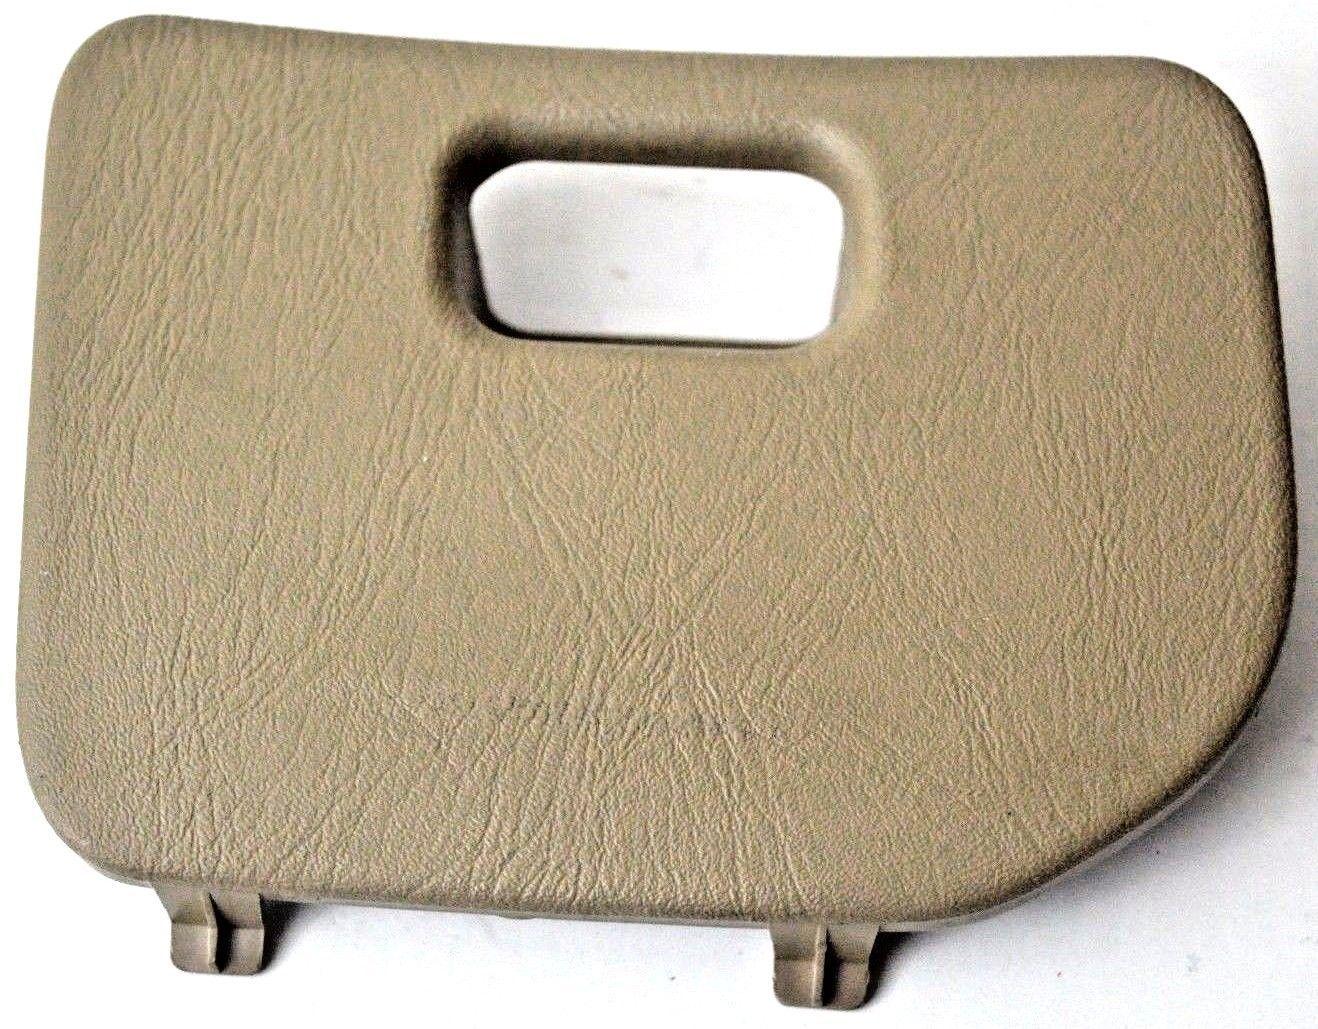 00 01 02 03 Nissan Maxima Tan Fuse Block and 50 similar items. S l1600